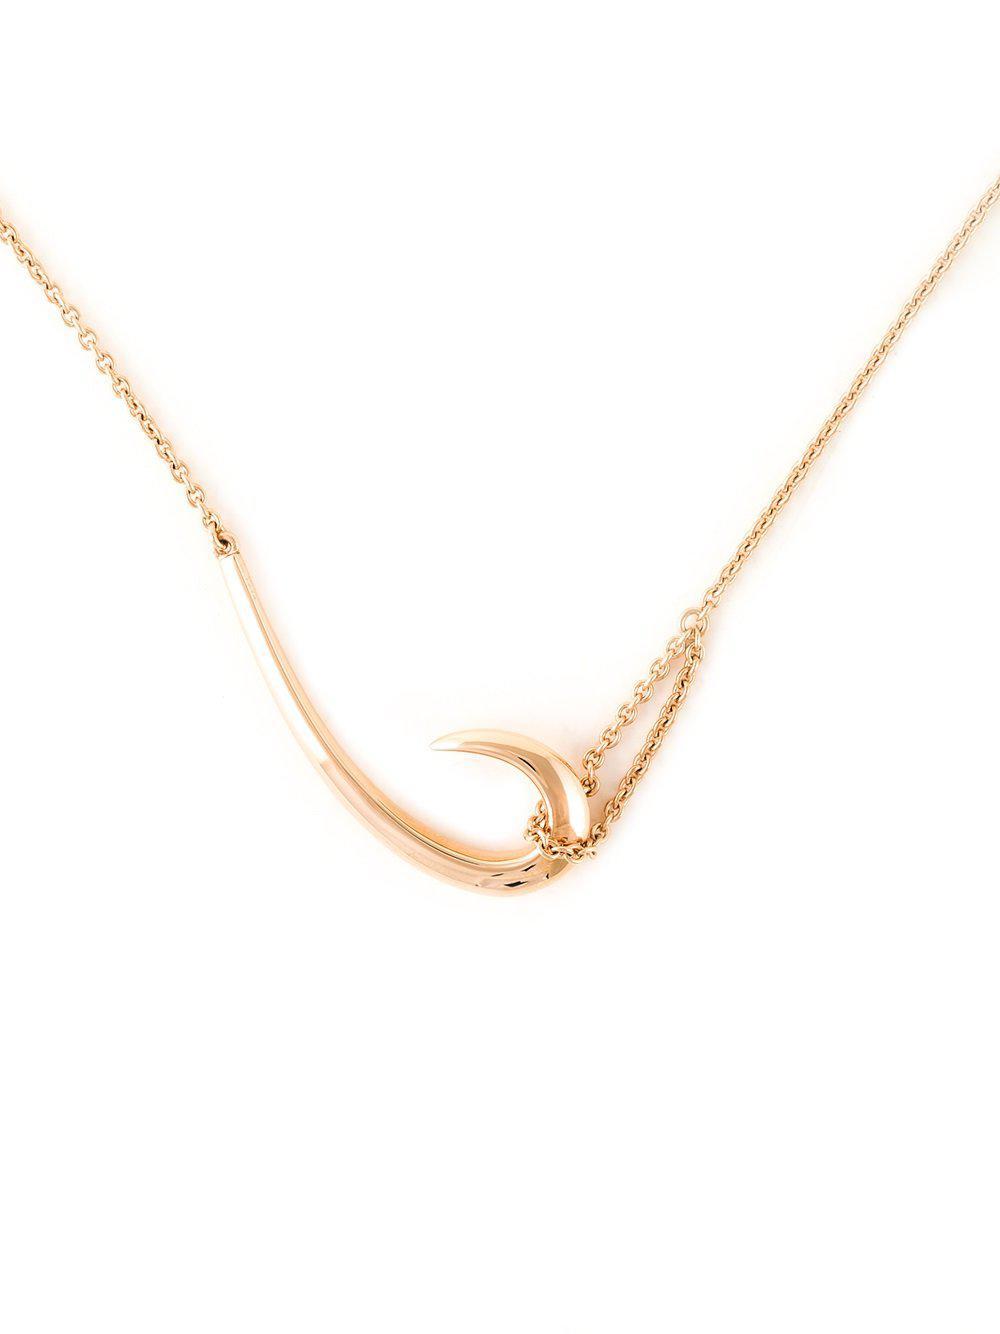 Shaun Leane Signature Tusk hook necklace - Metallic fpUSclW839